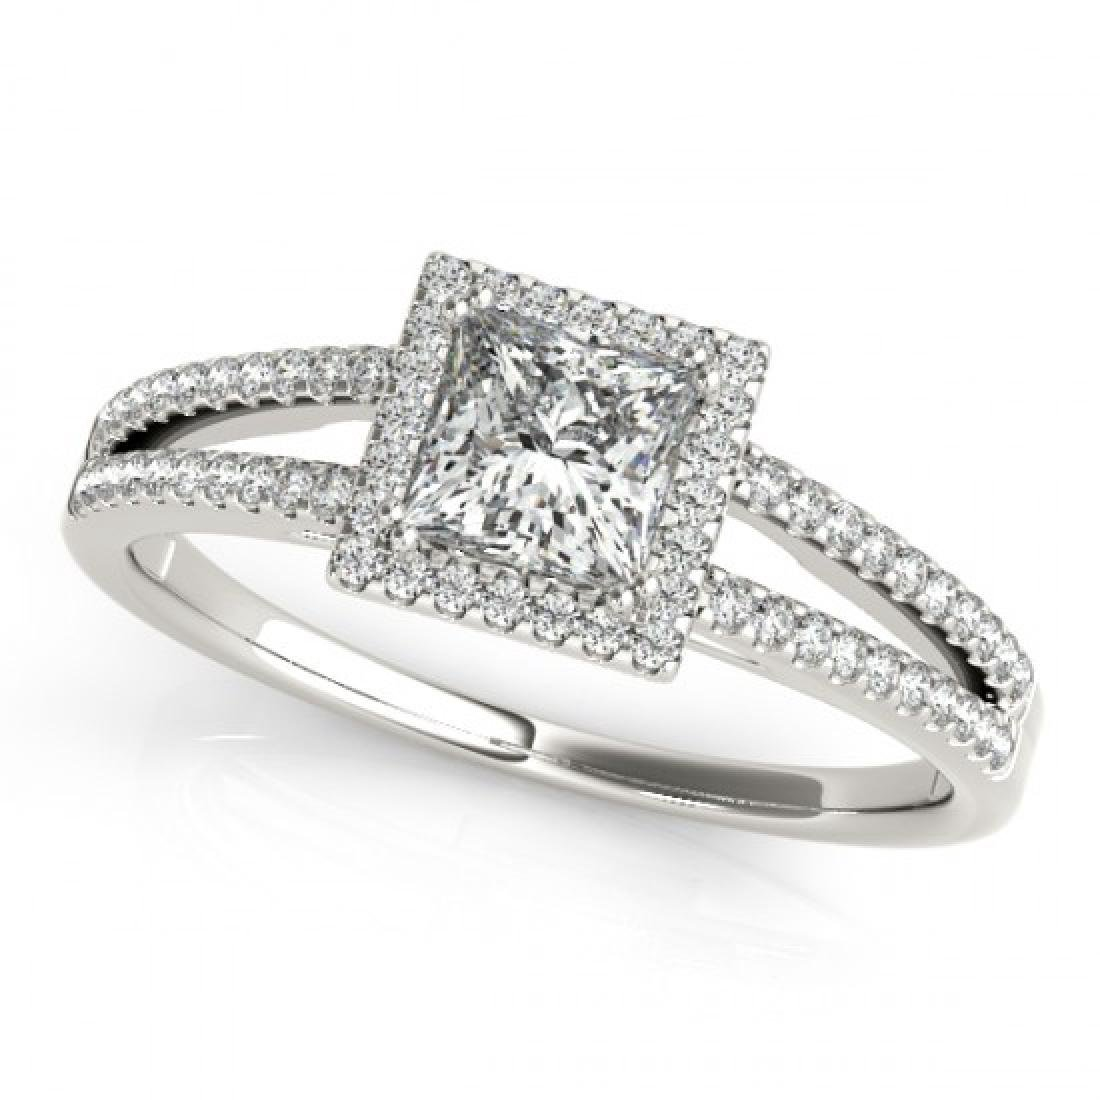 1.40 CTW Certified VS/SI Princess Diamond Solitaire